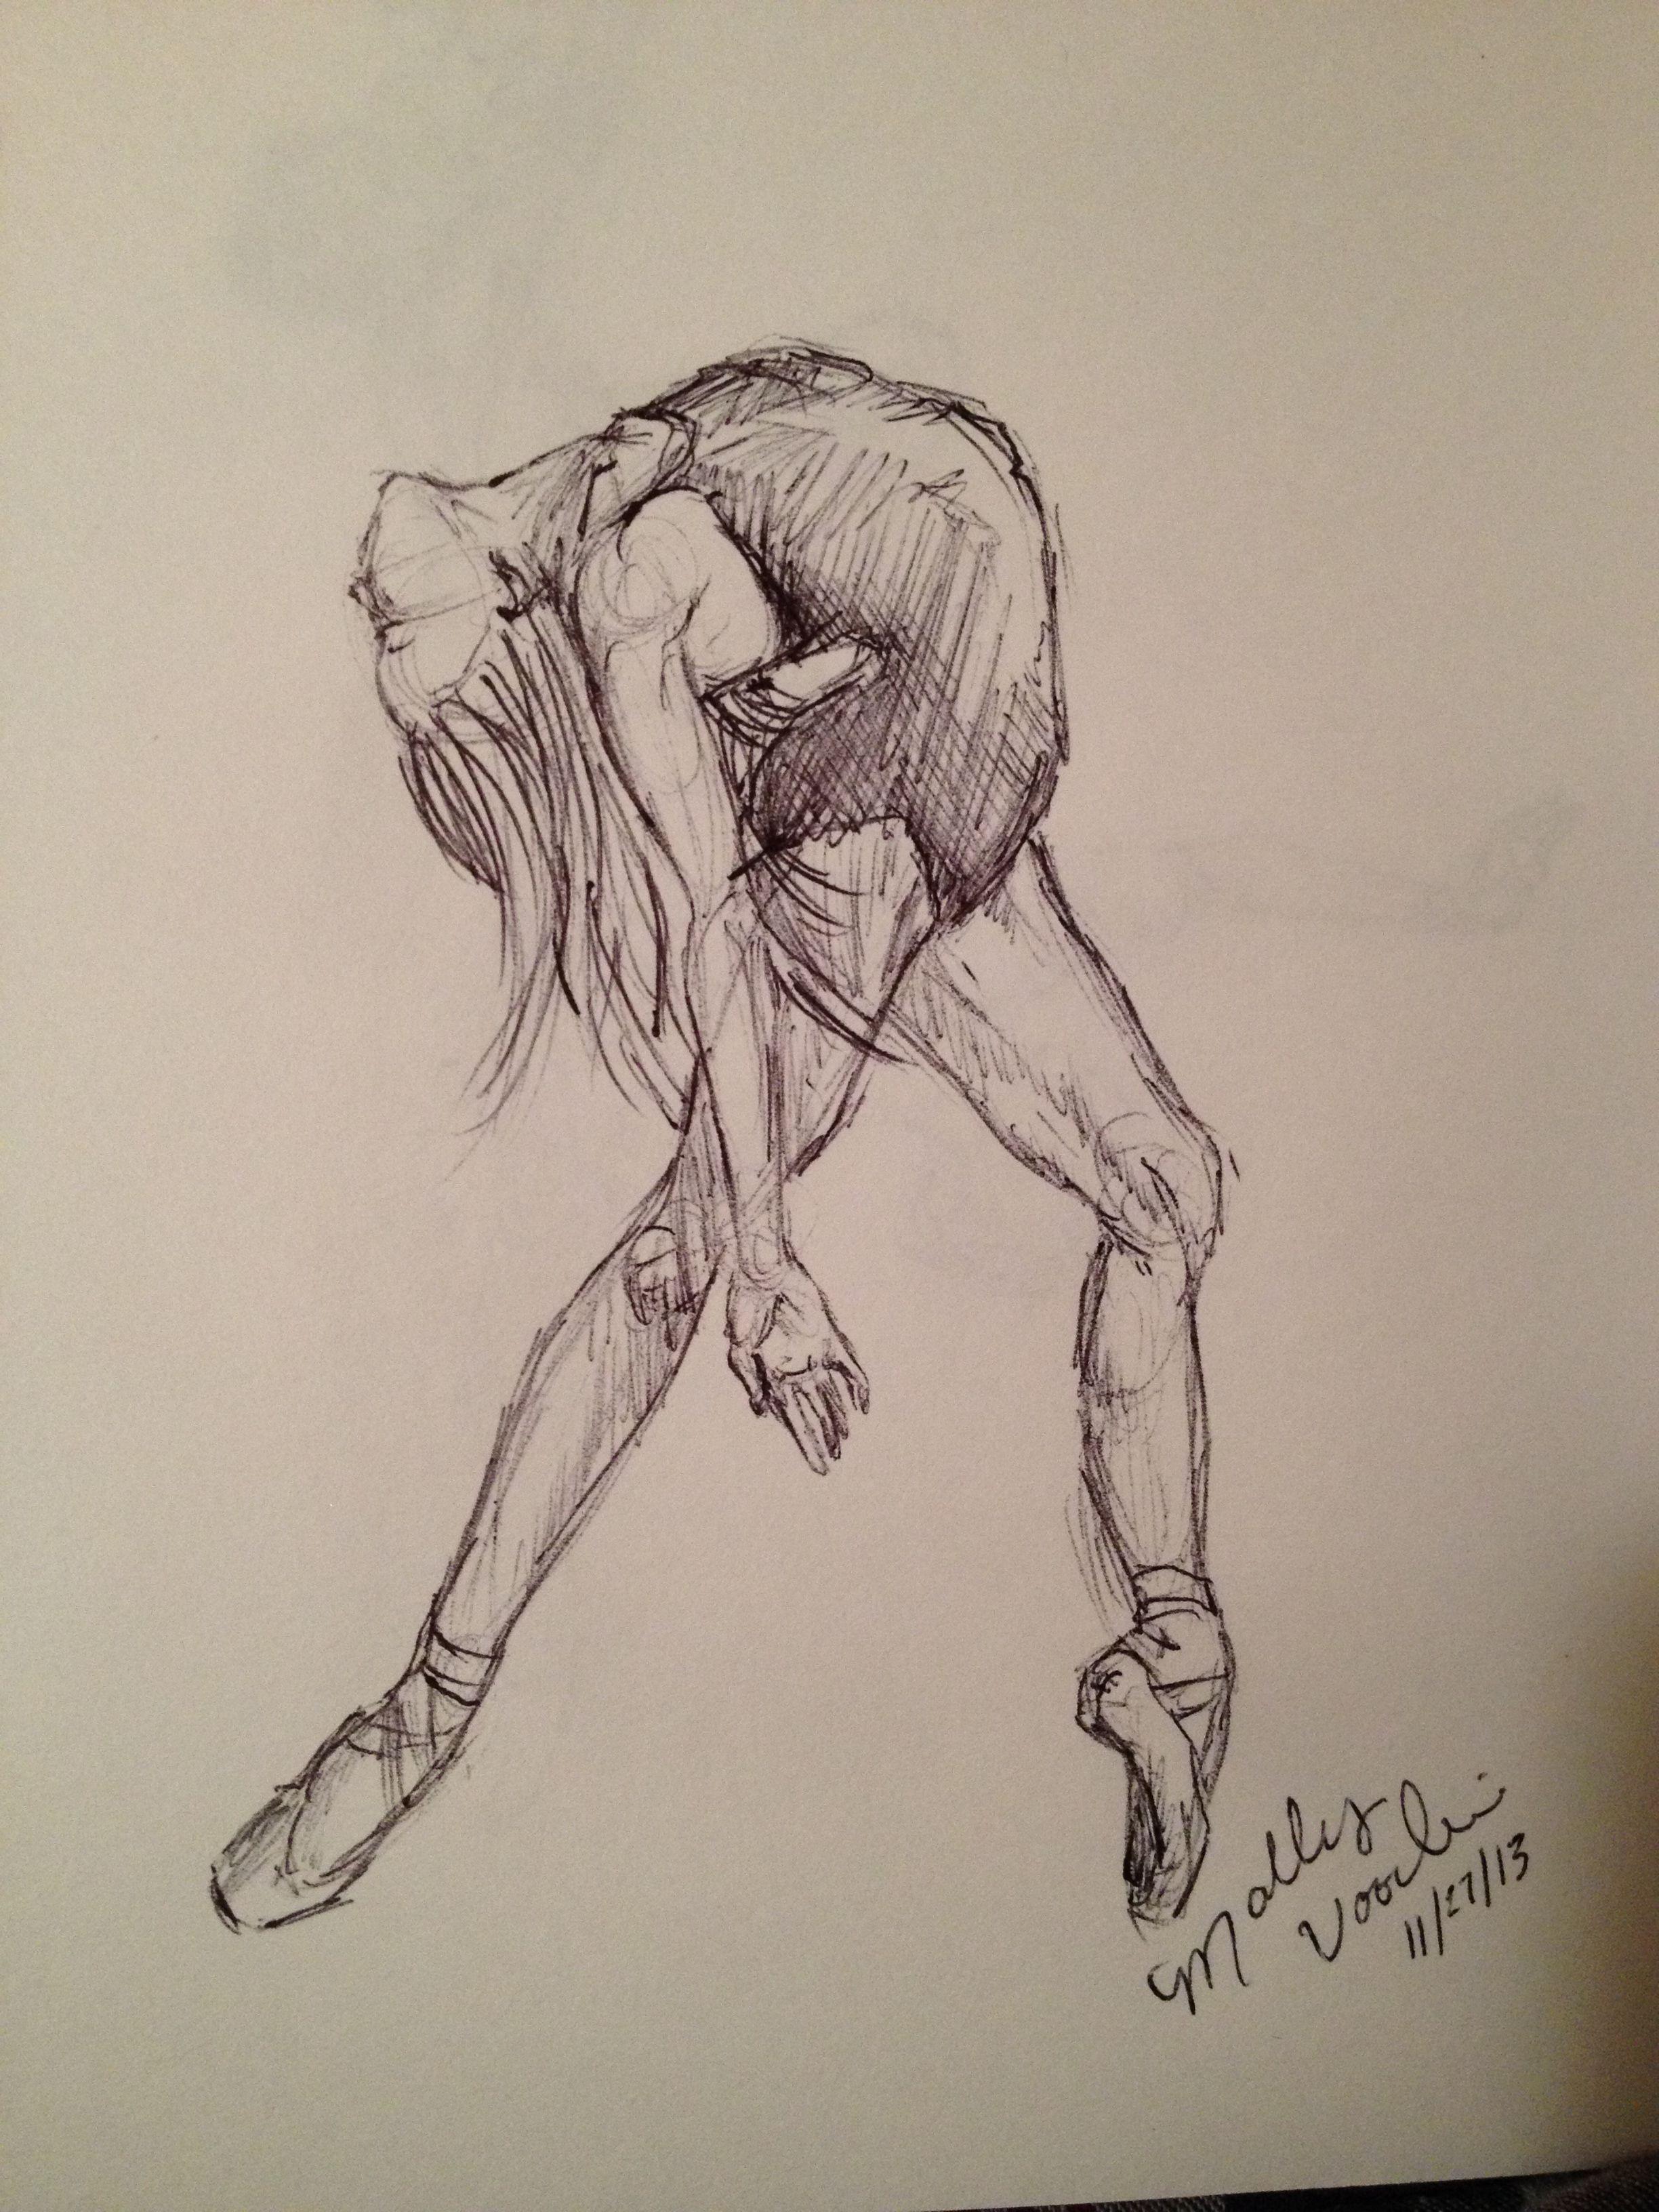 танцующий человек картинки карандашом подчёркивают тот